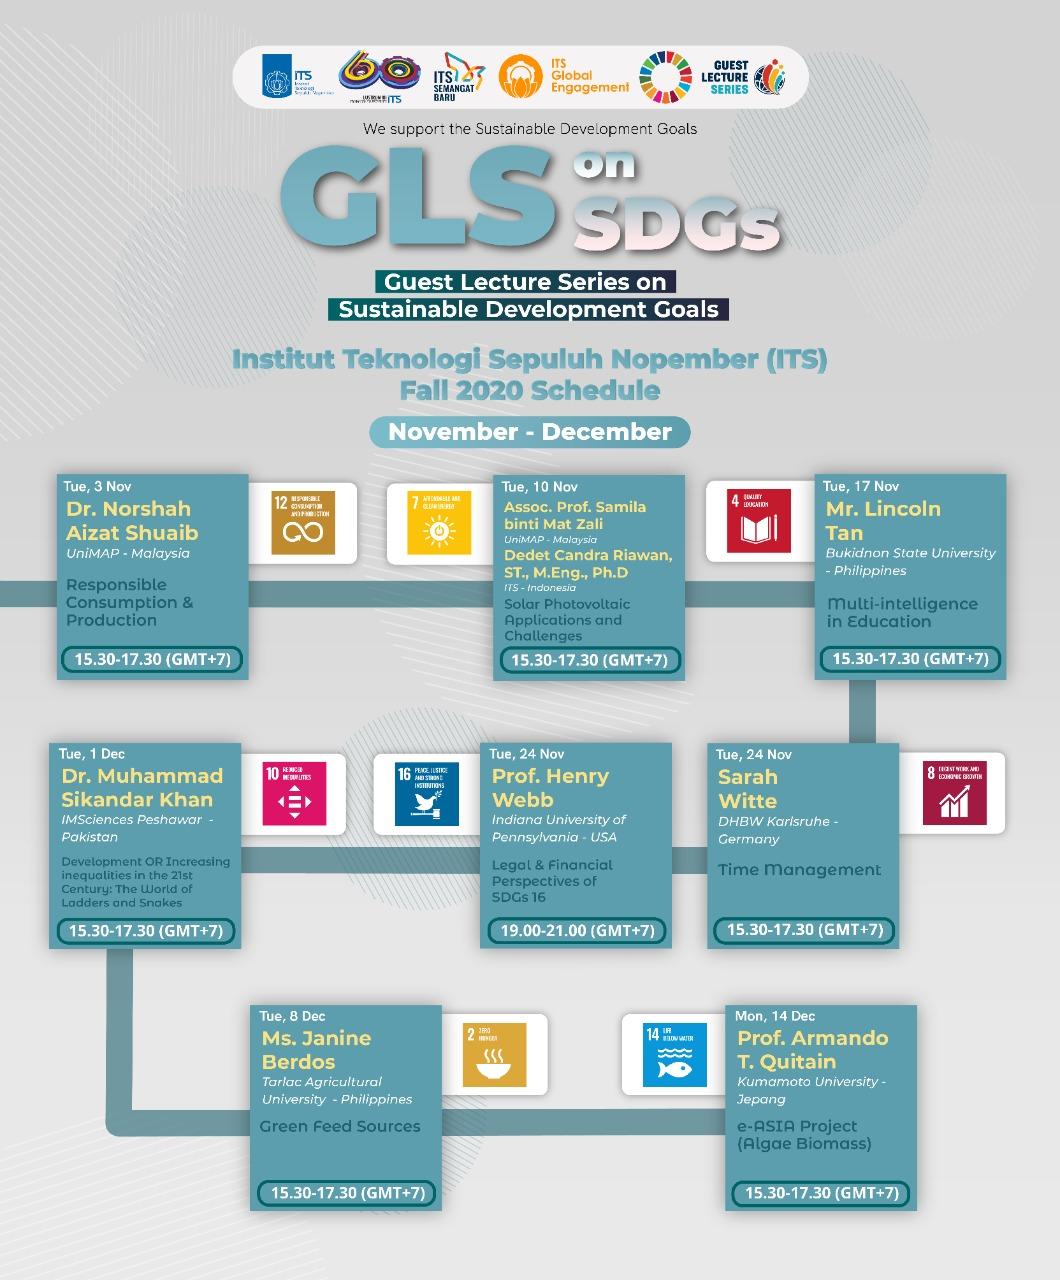 Lectures schedule - November / December